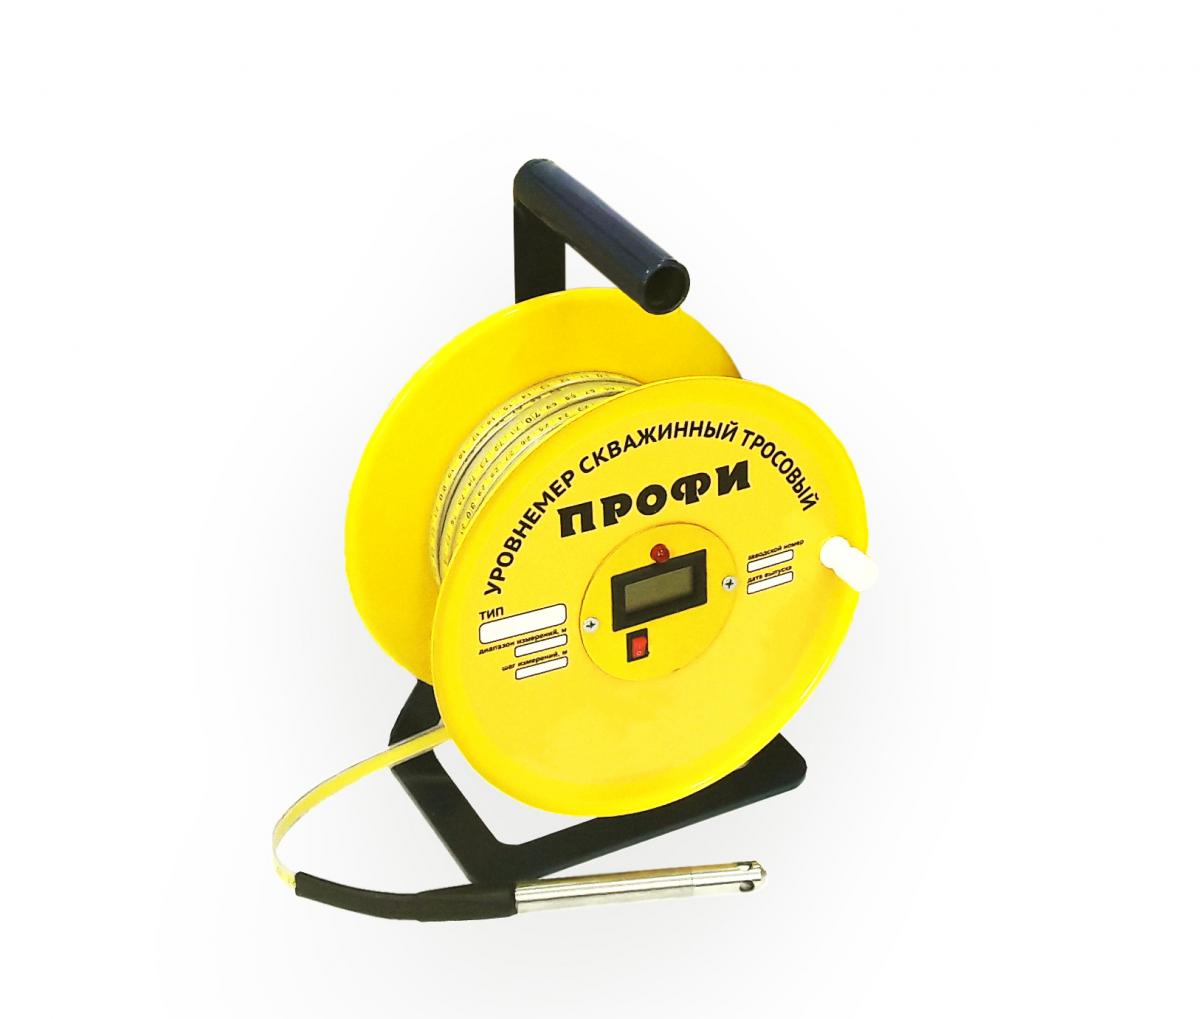 Уровнемер с термометром УТСК-ТЭ ПРОФИ-150